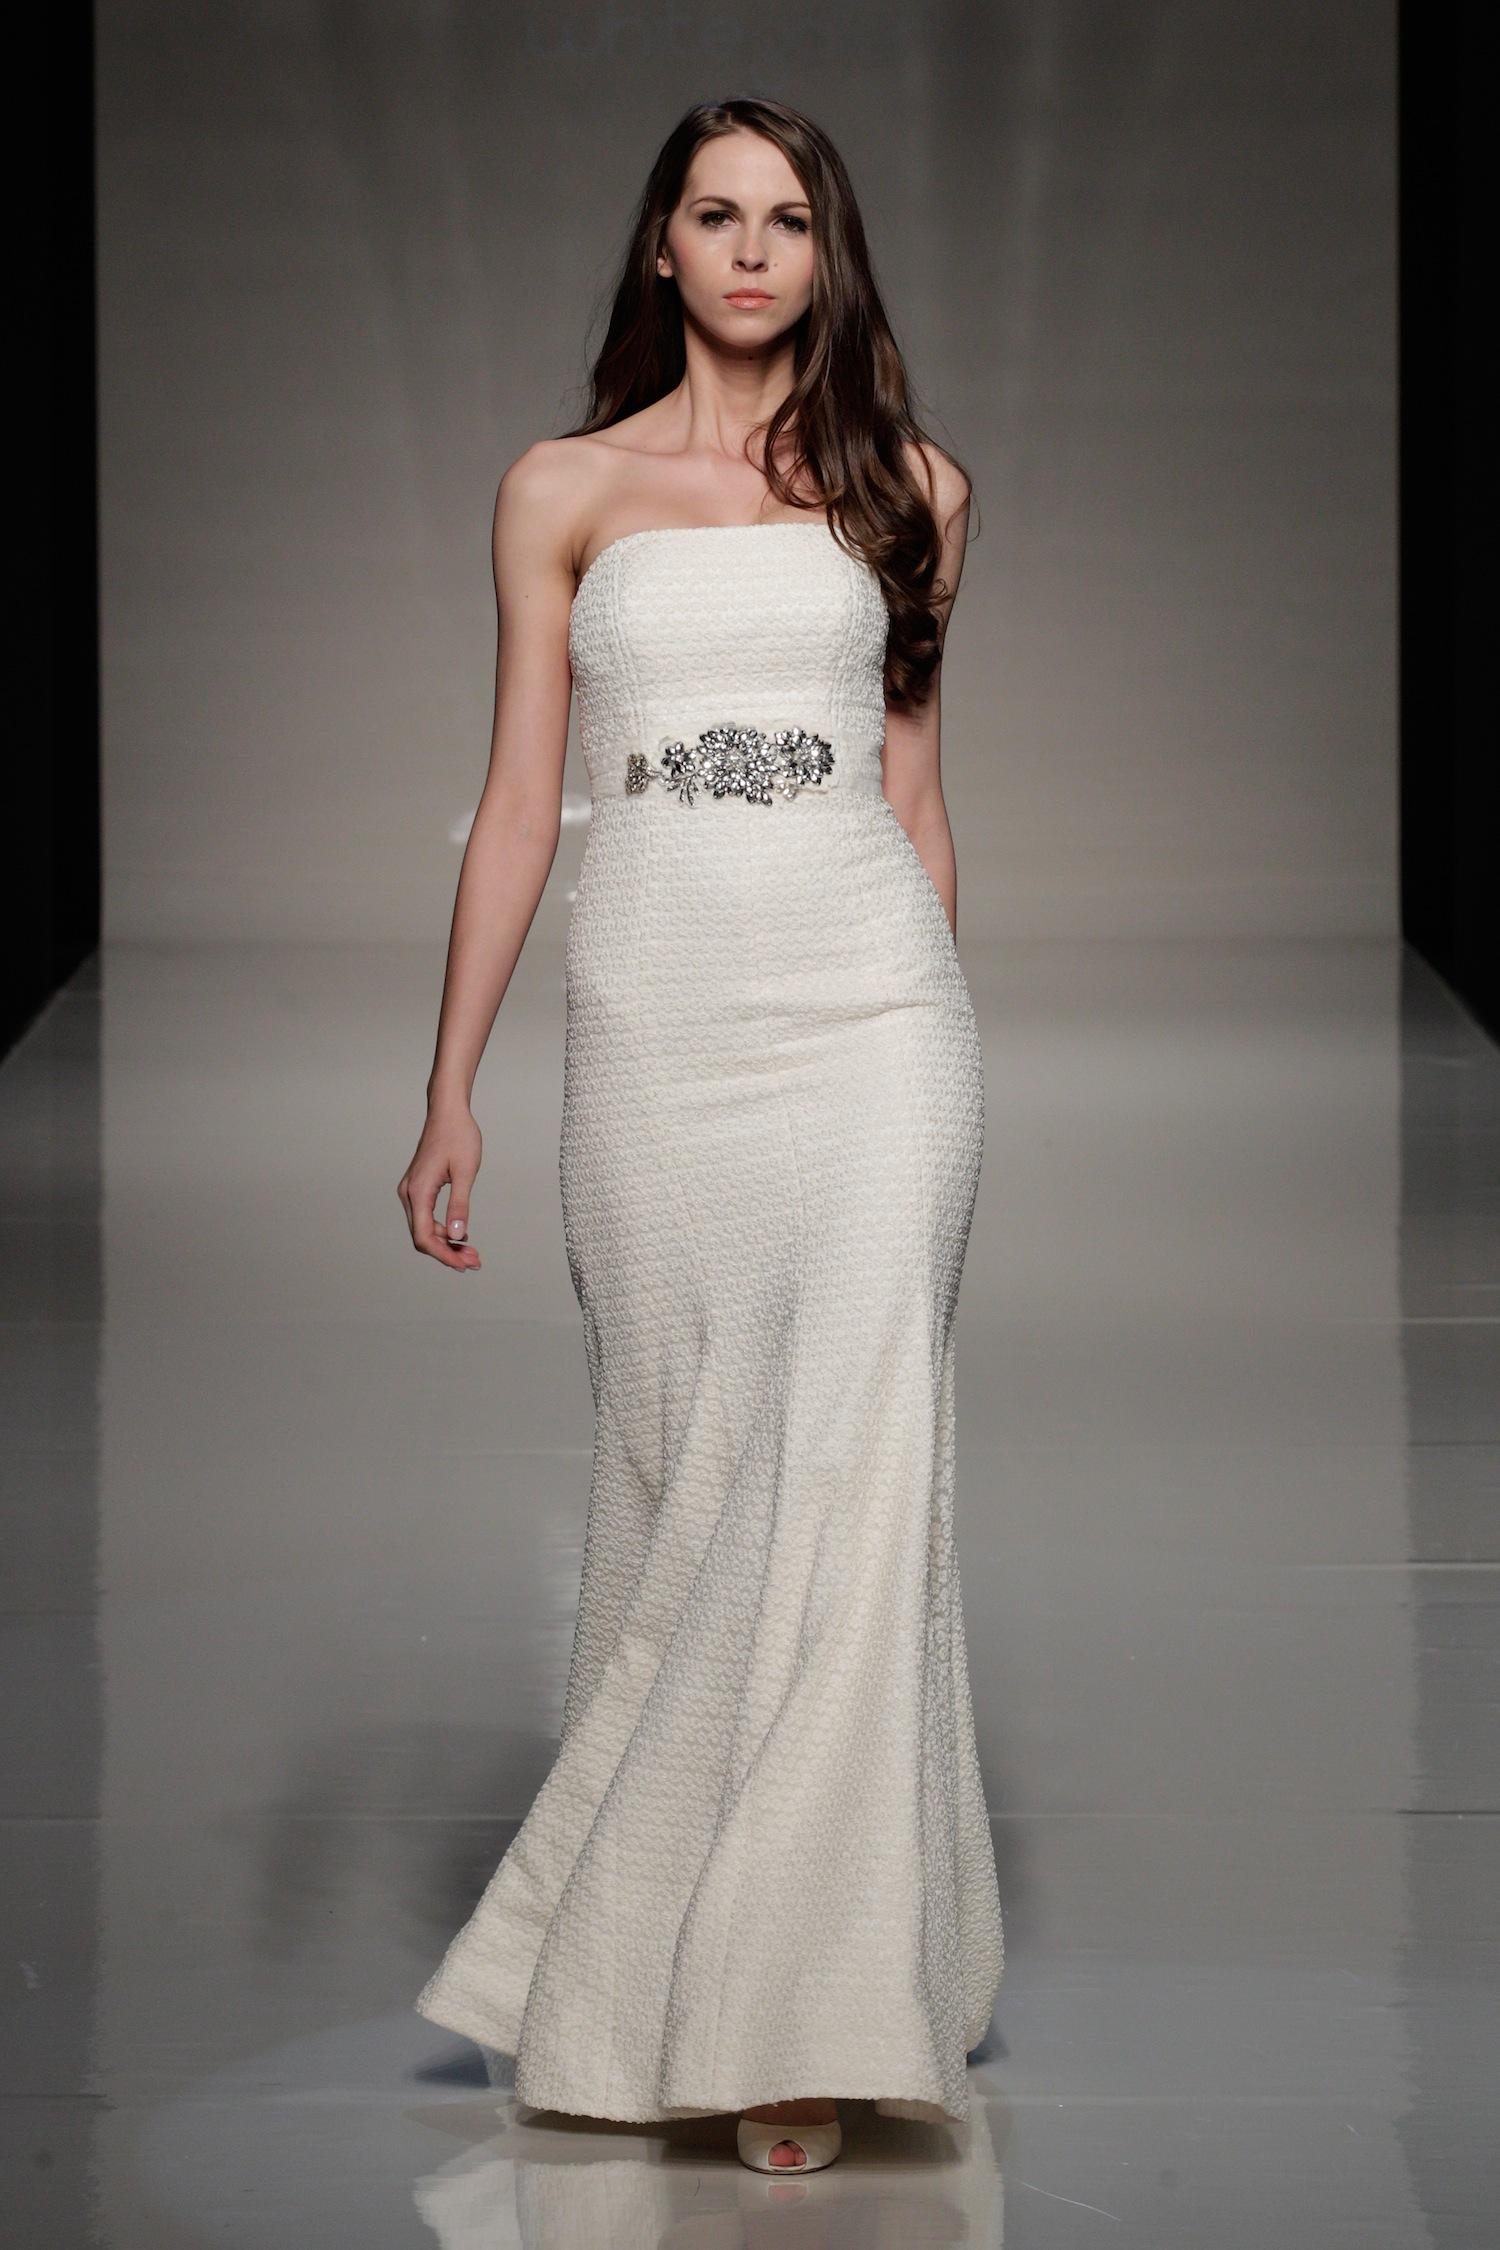 Vera Wang Wedding Dresses Outlet | Dress images